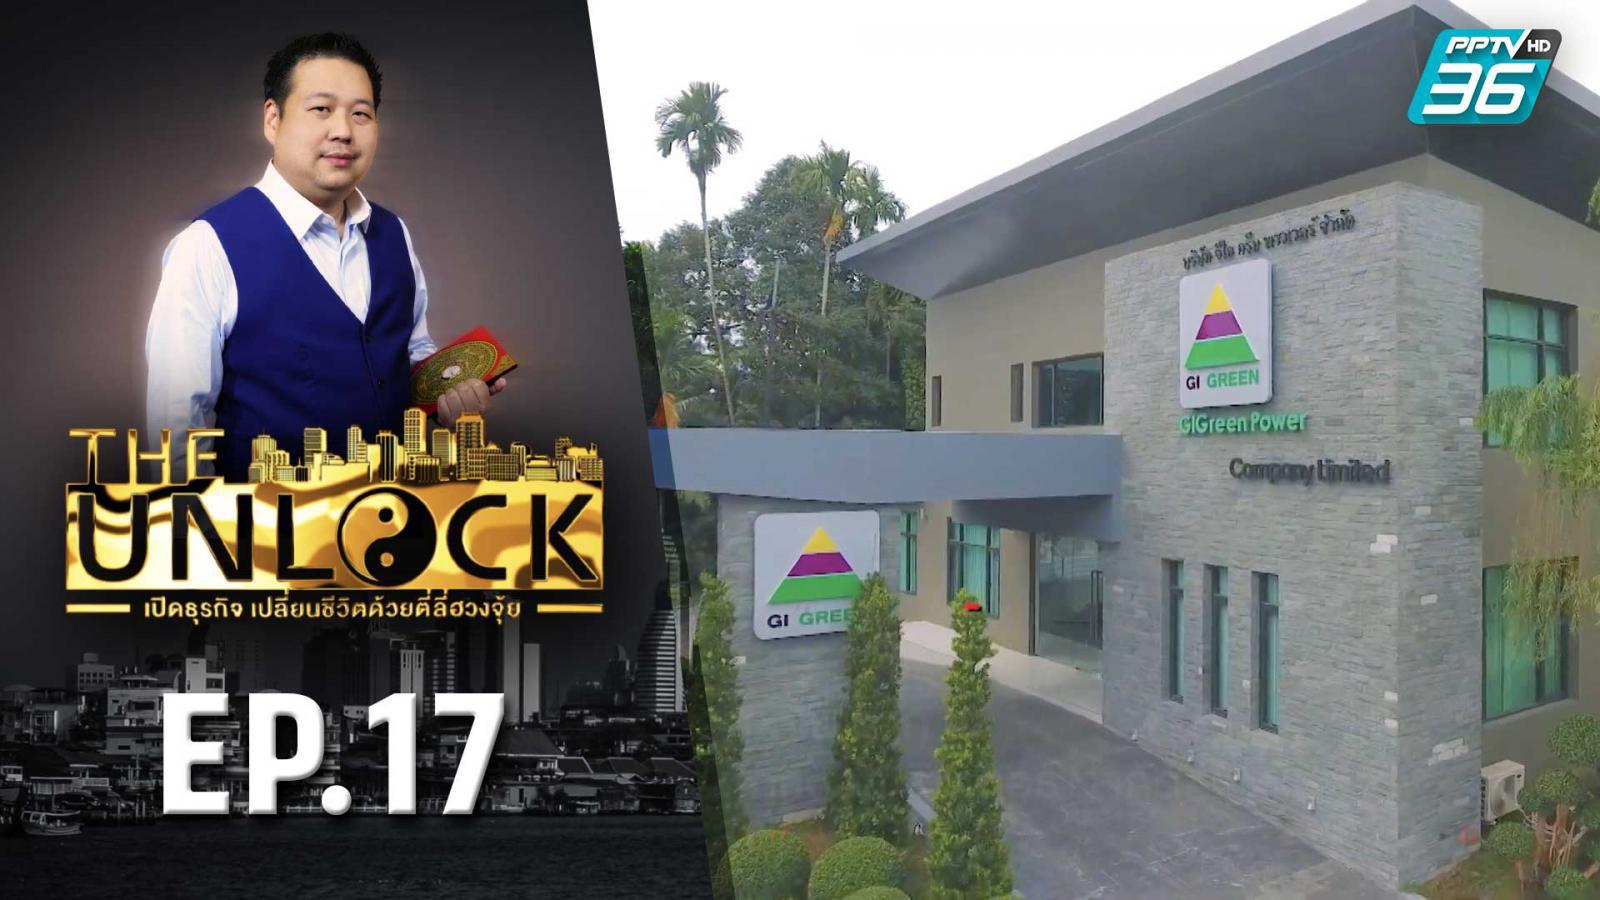 The Unlock เปิดธุรกิจ เปลี่ยนชีวิตด้วยตี่ลี่ฮวงจุ้ย | บริษัทน้ำมันปาล์ม EP.17 (1/3) | PPTVHD 36